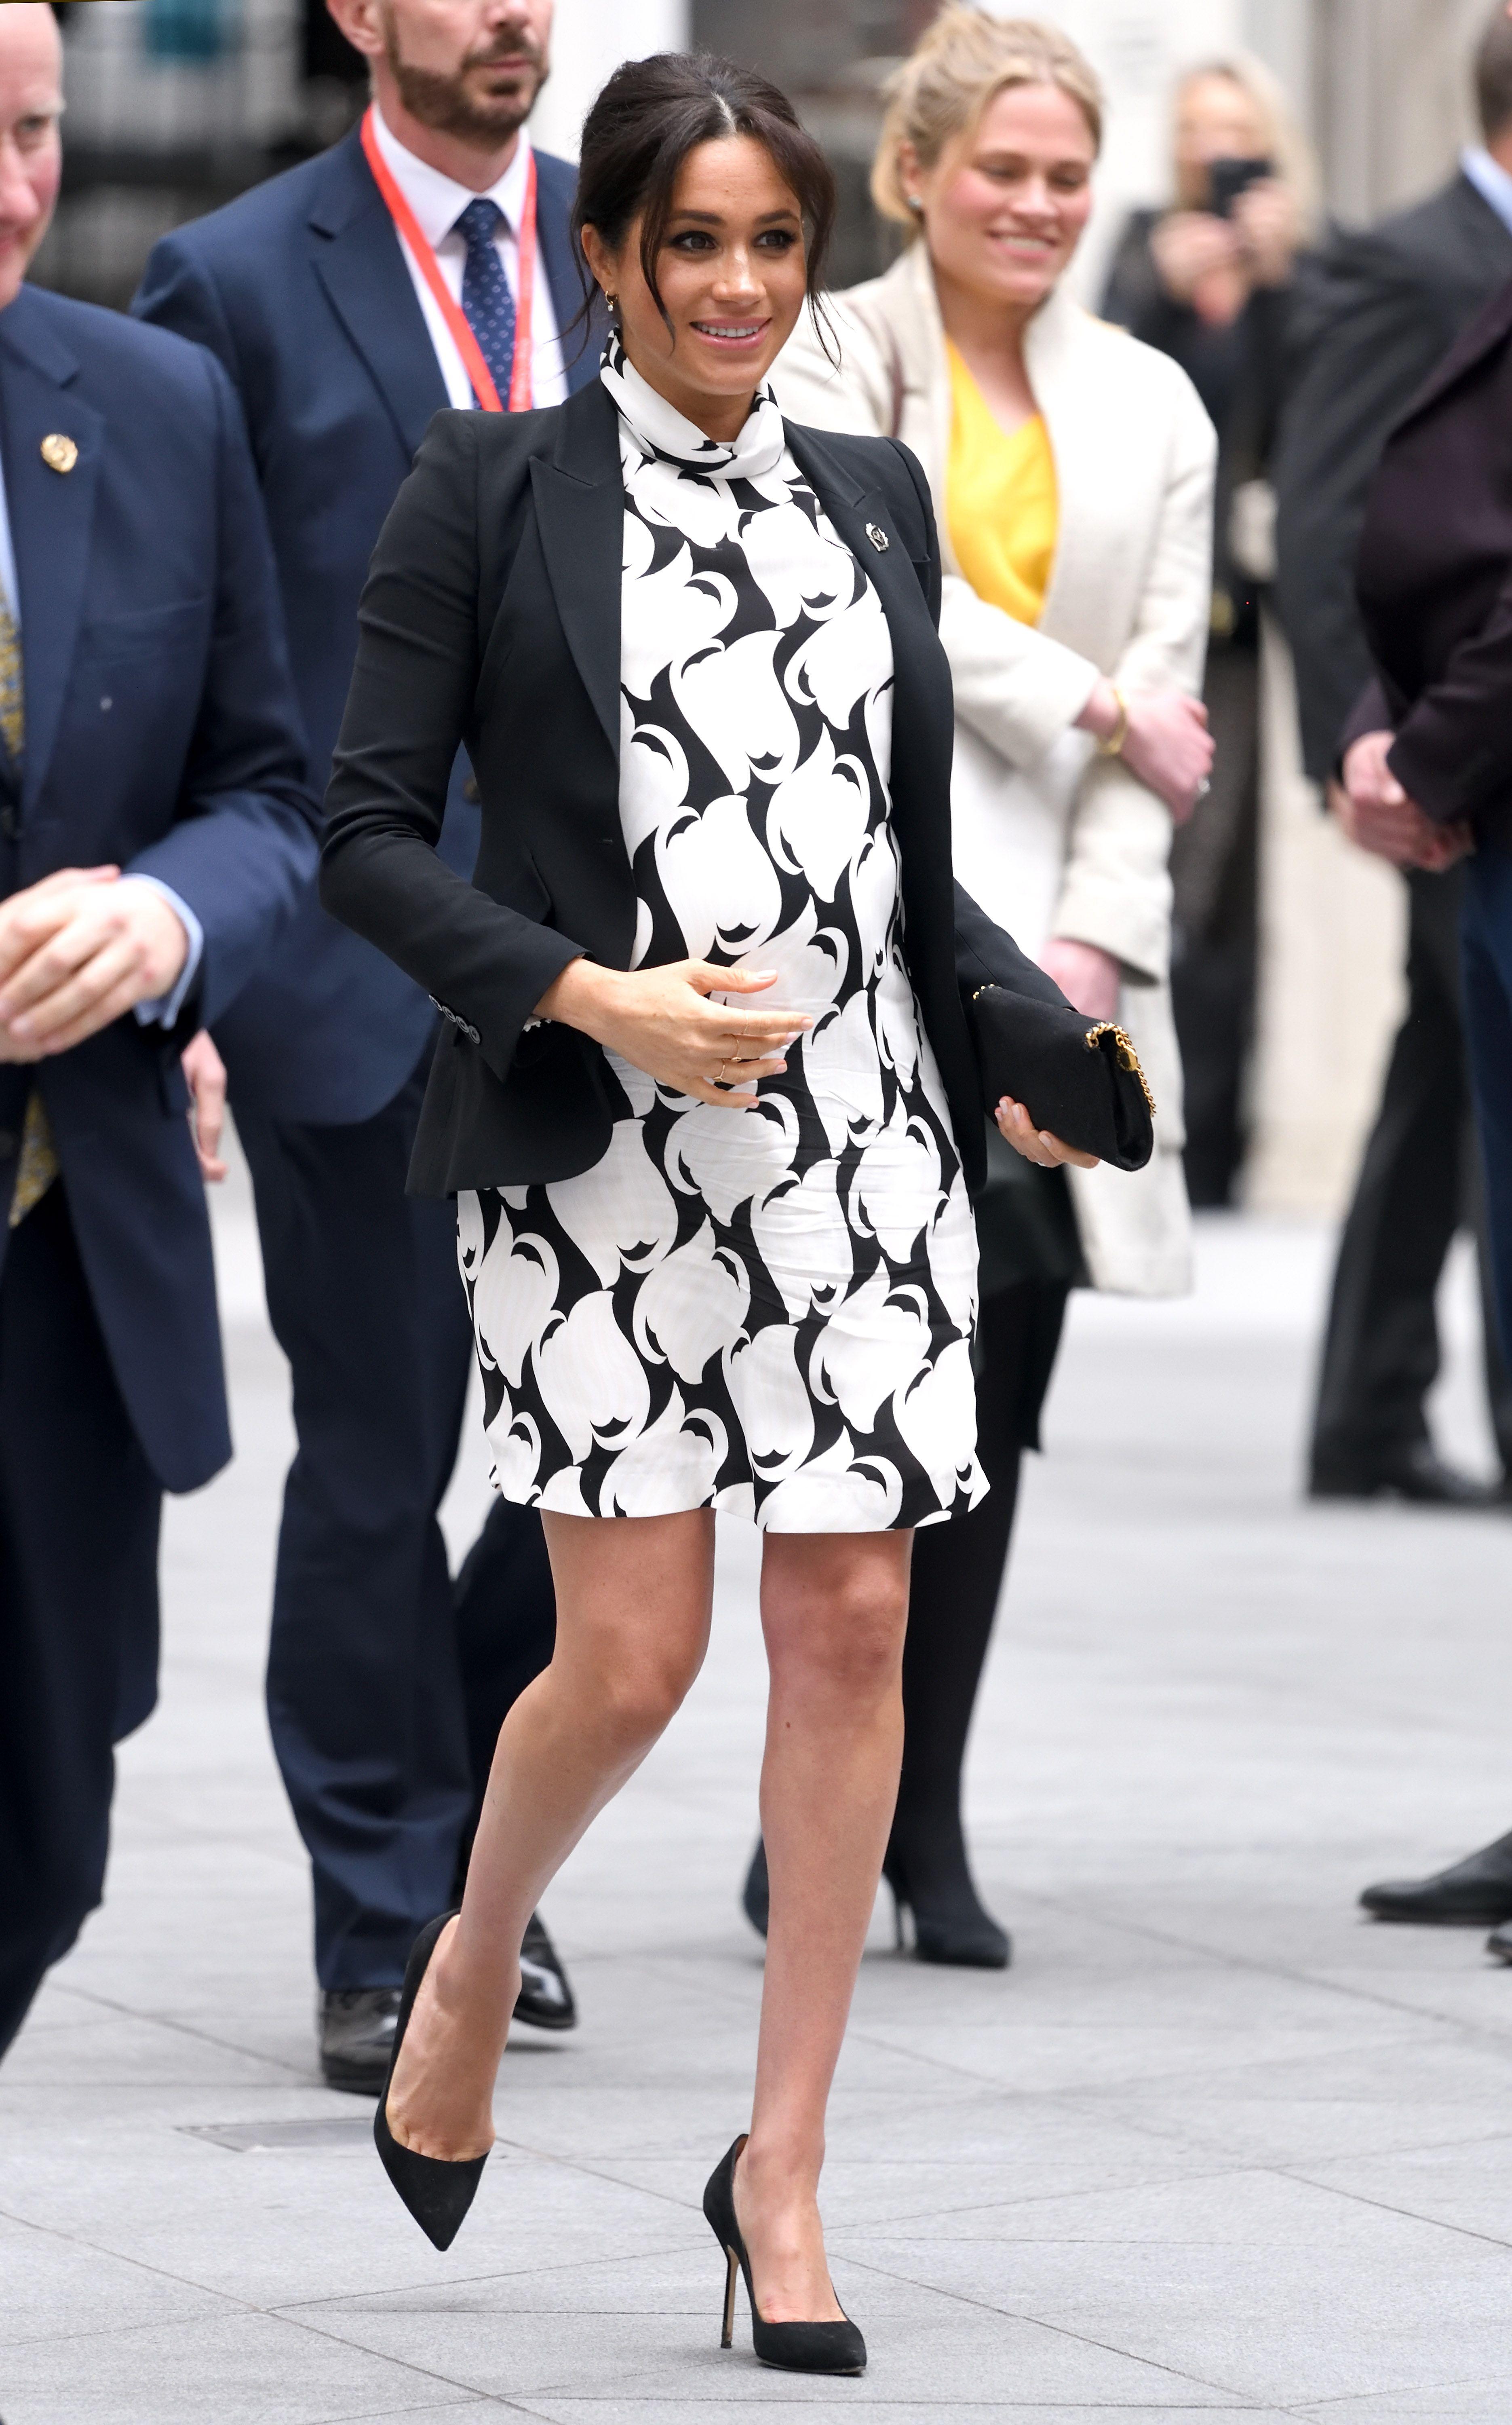 124a83e13cb Meghan Markle Maternity Style - Every Meghan Markle Pregnancy Outfit